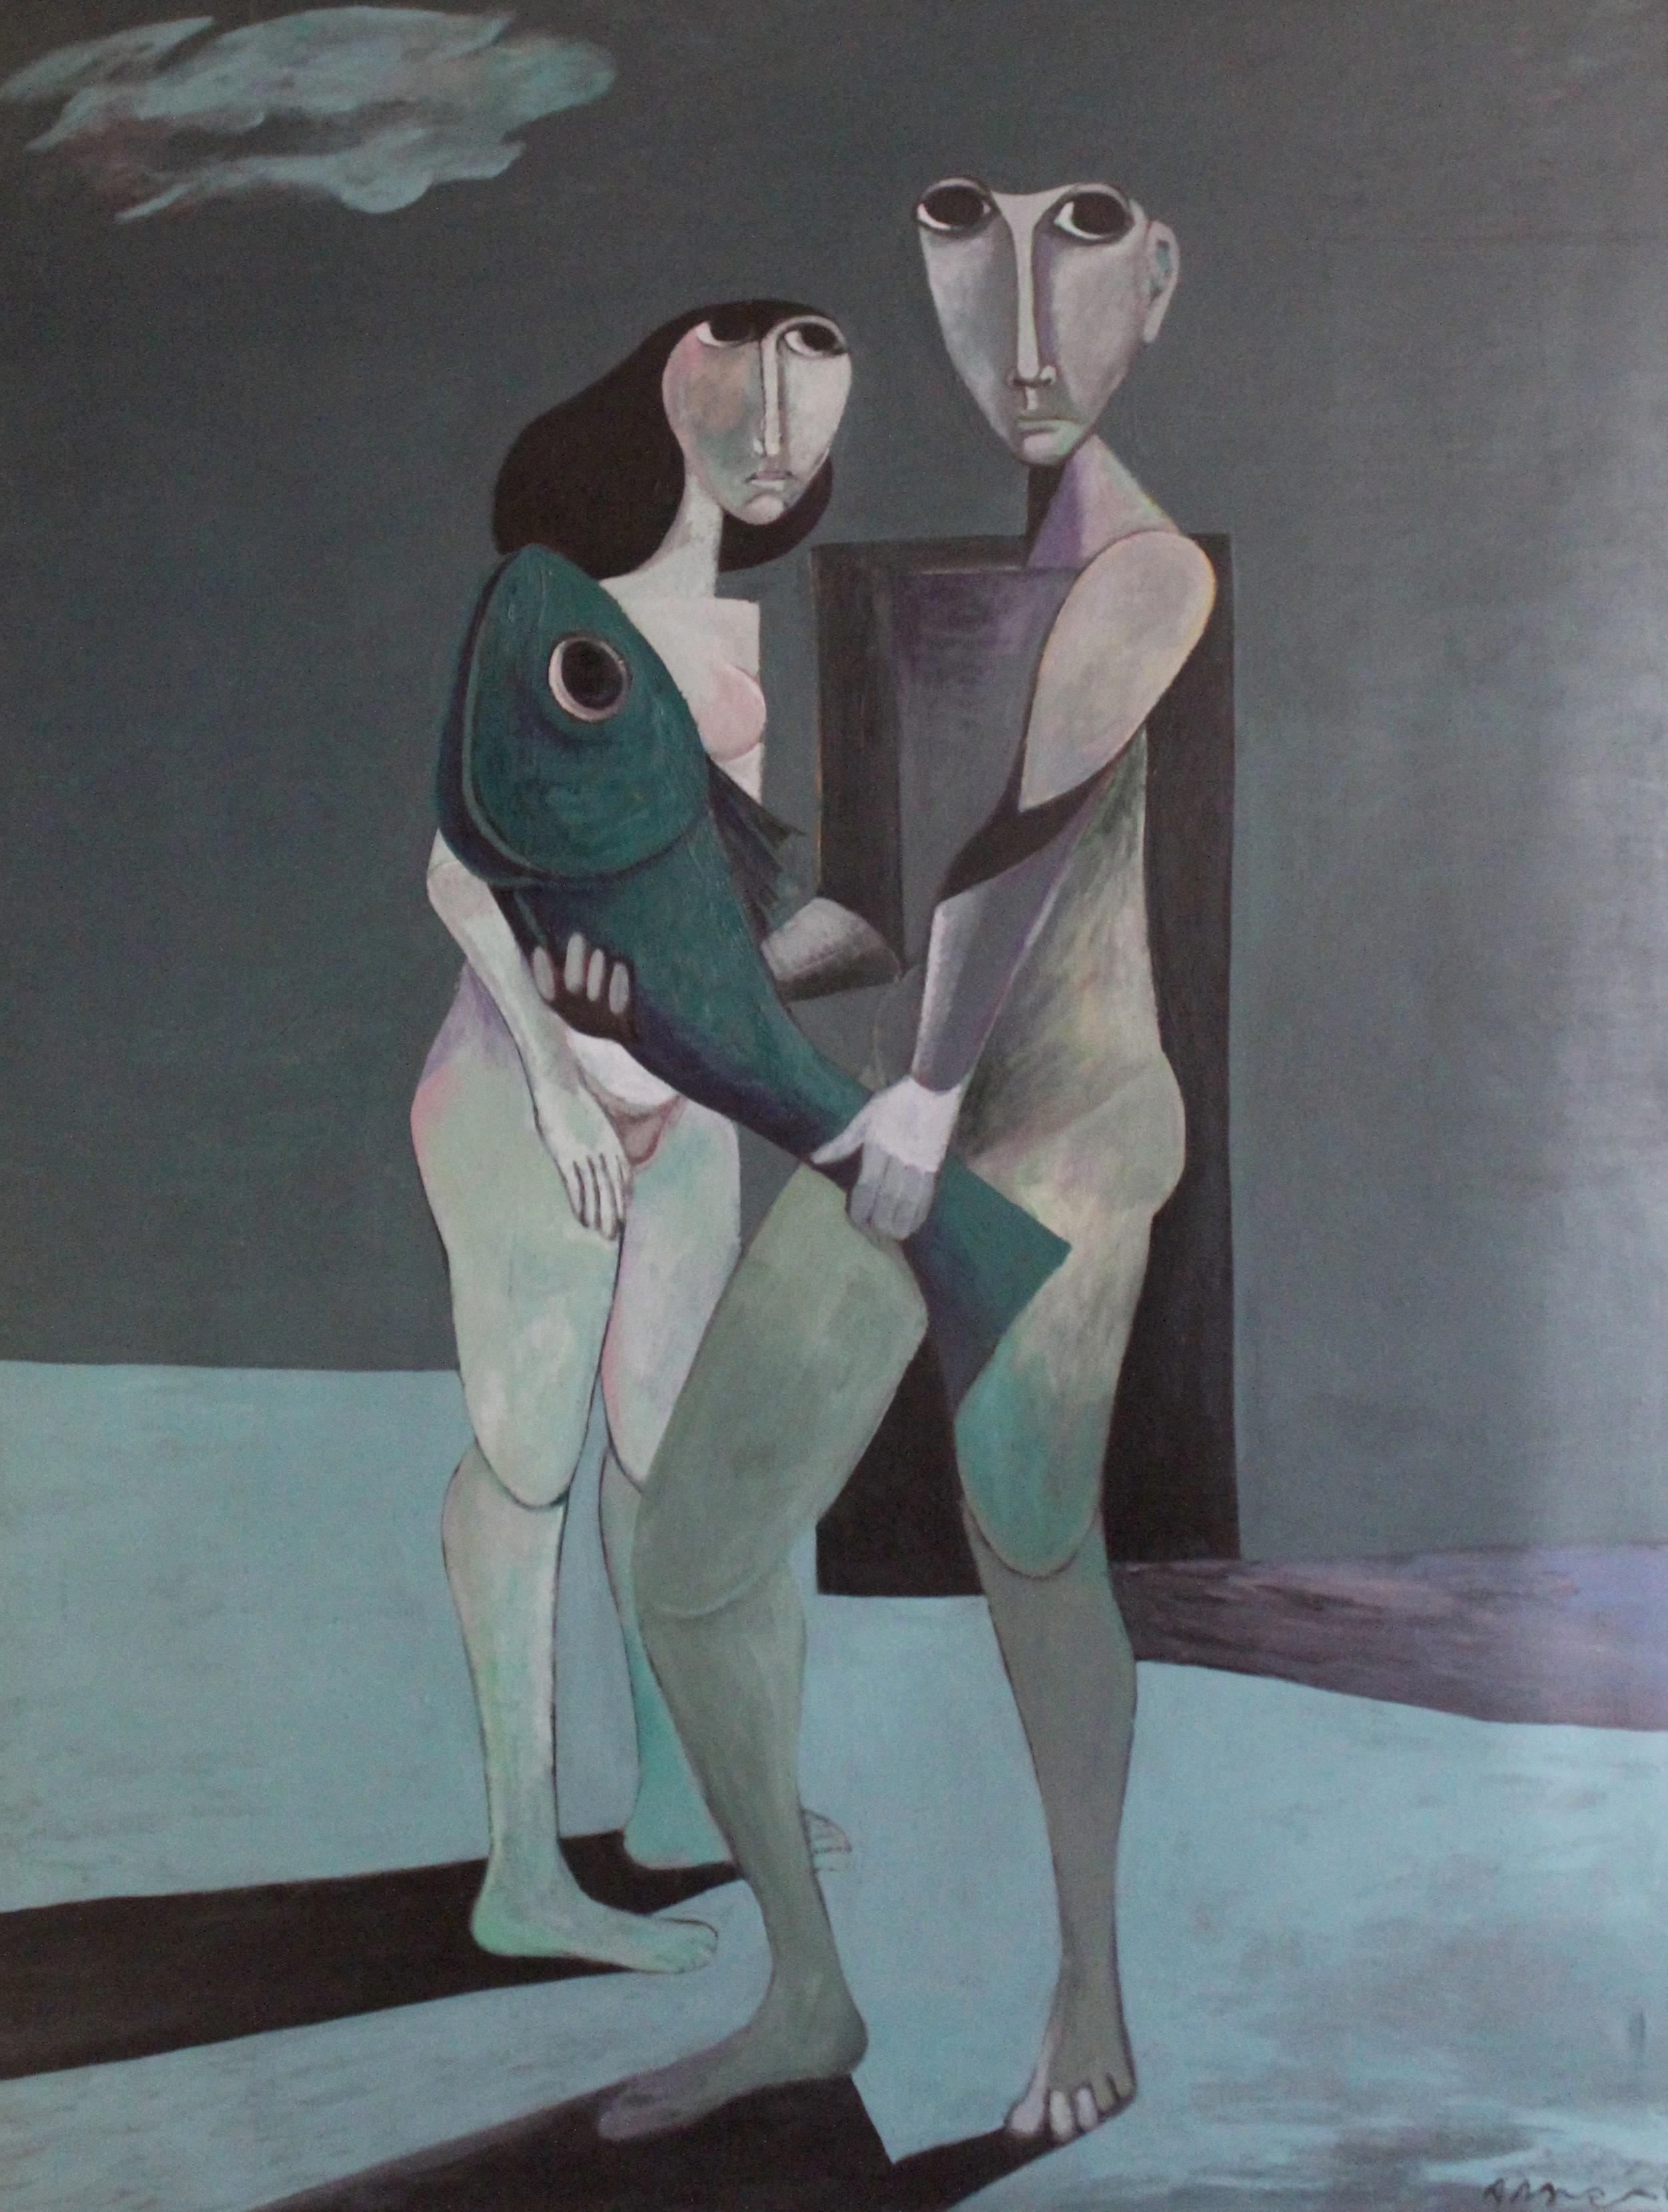 Ahmed Morsi, Green fish, 1985, Acrylic on canvas, 200 x 155 cm.